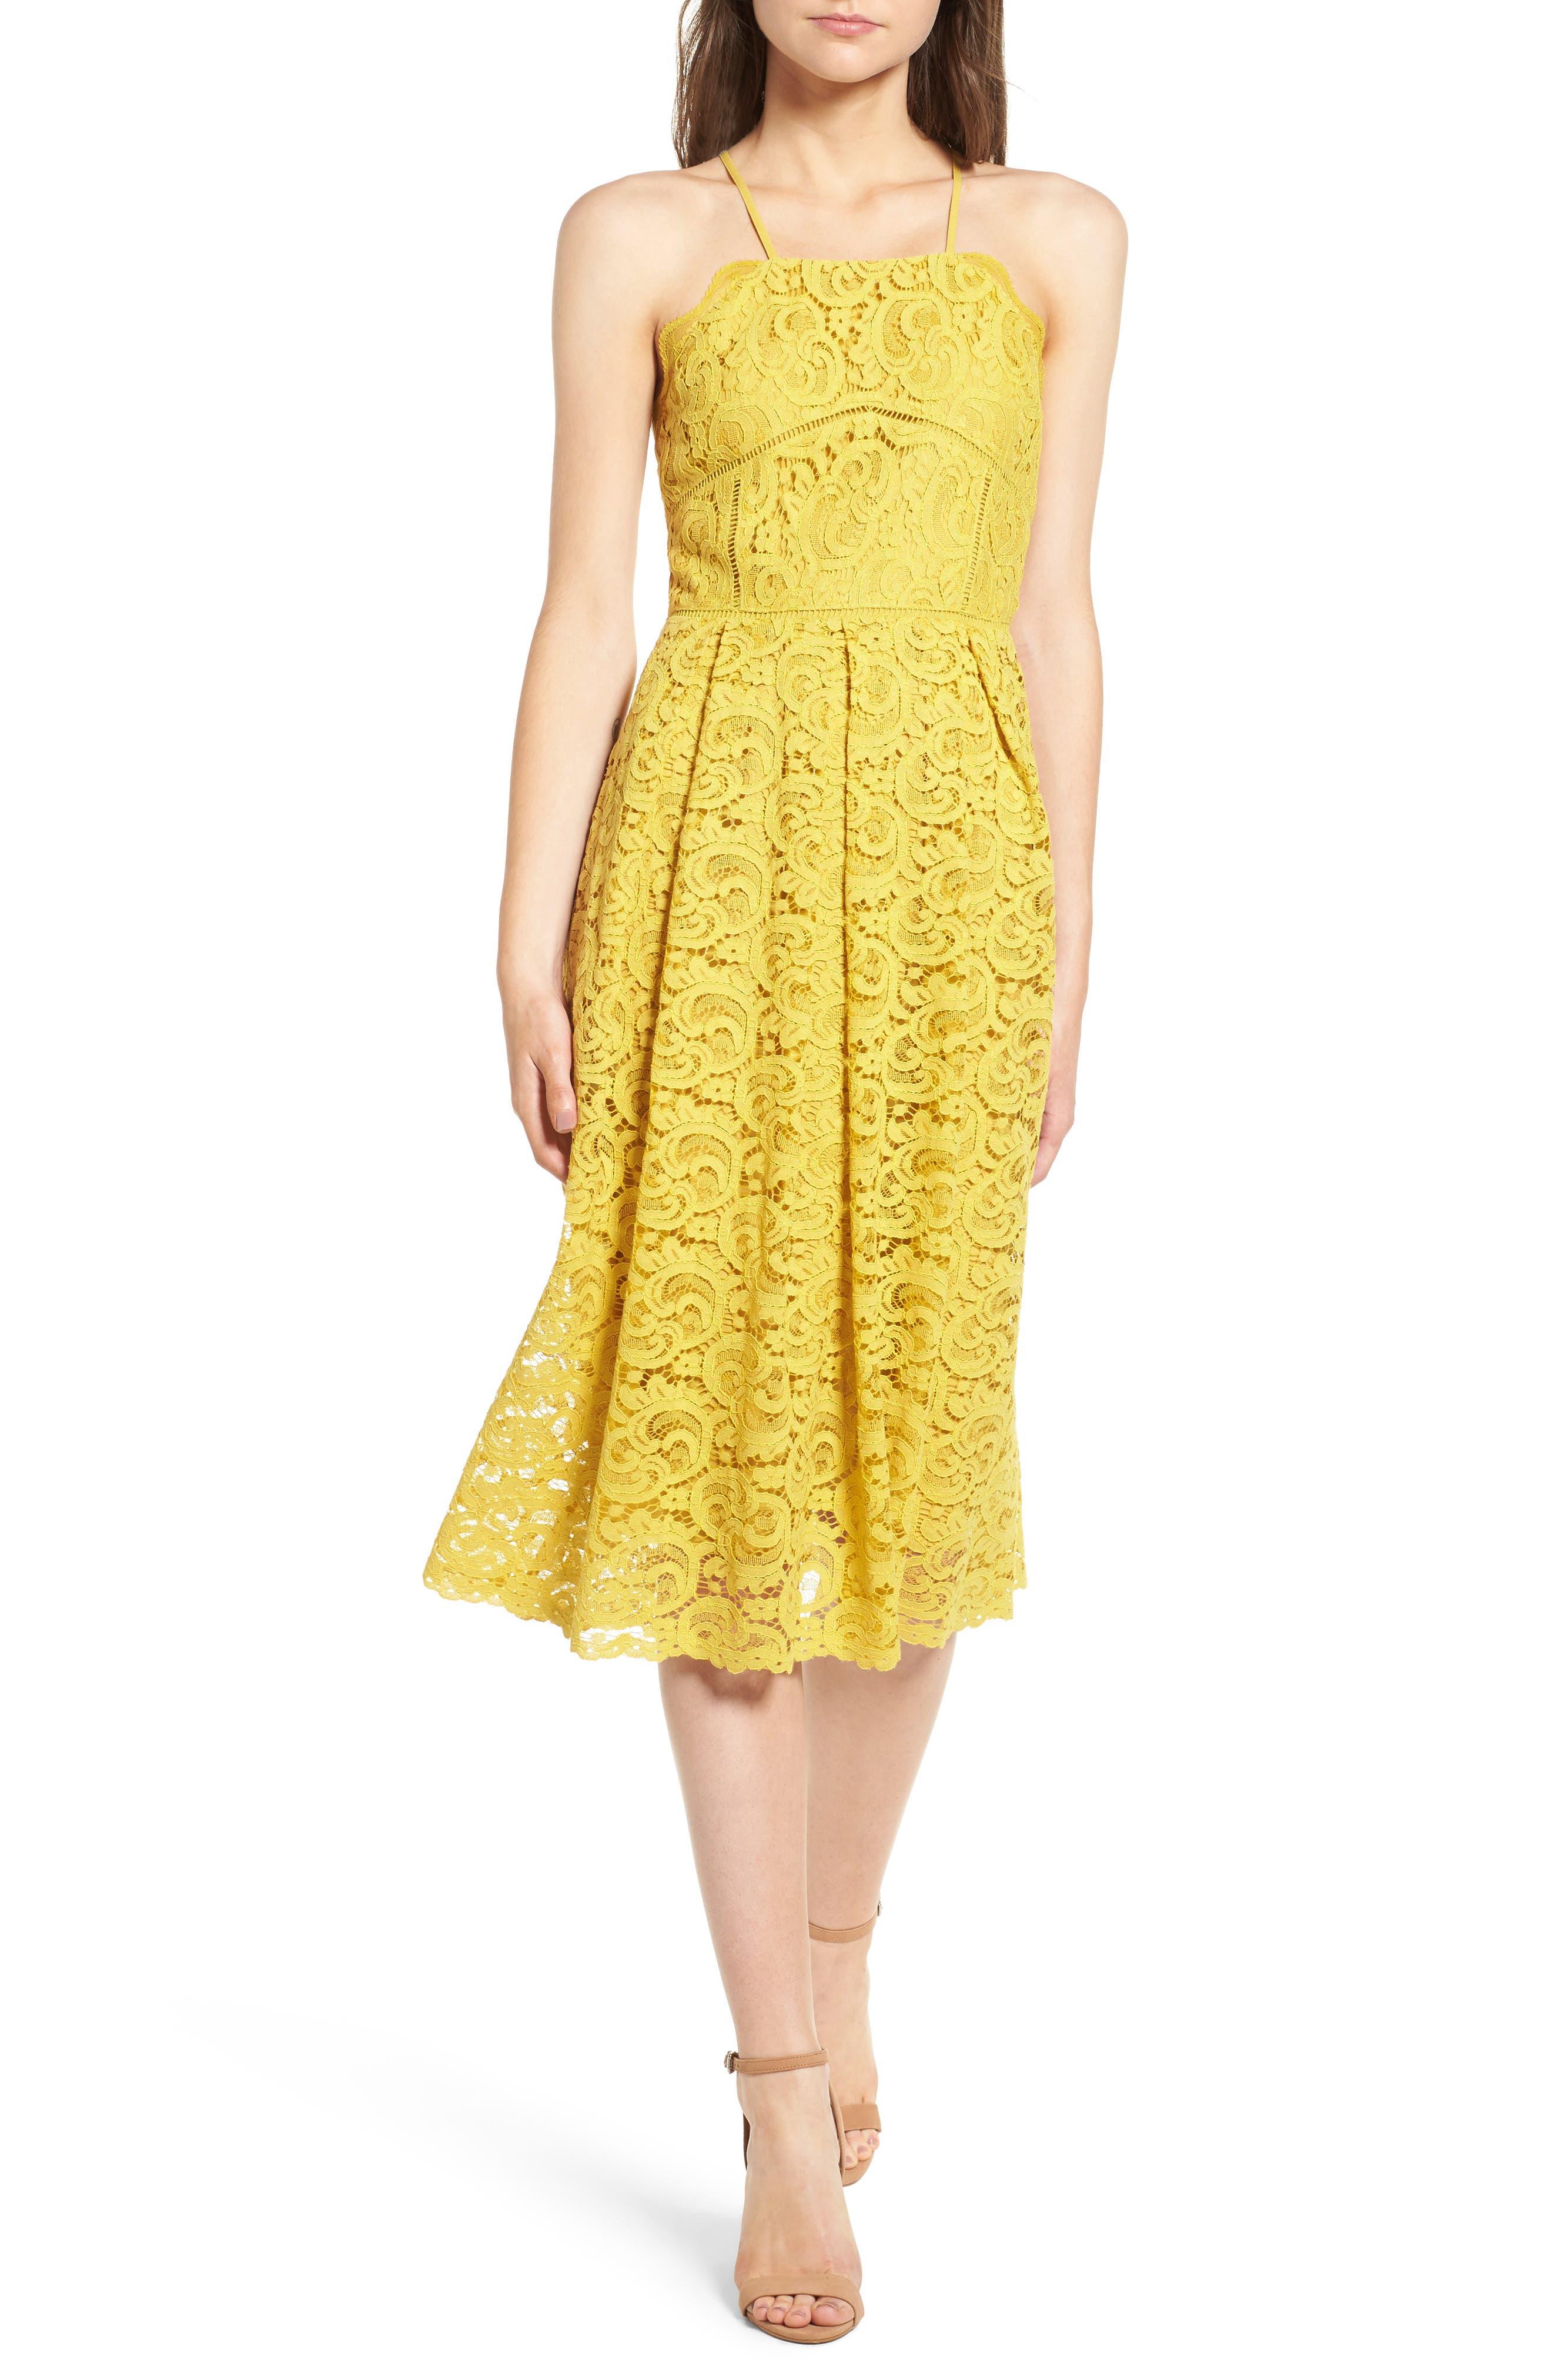 Main Image - J.O.A. Lace Midi Dress